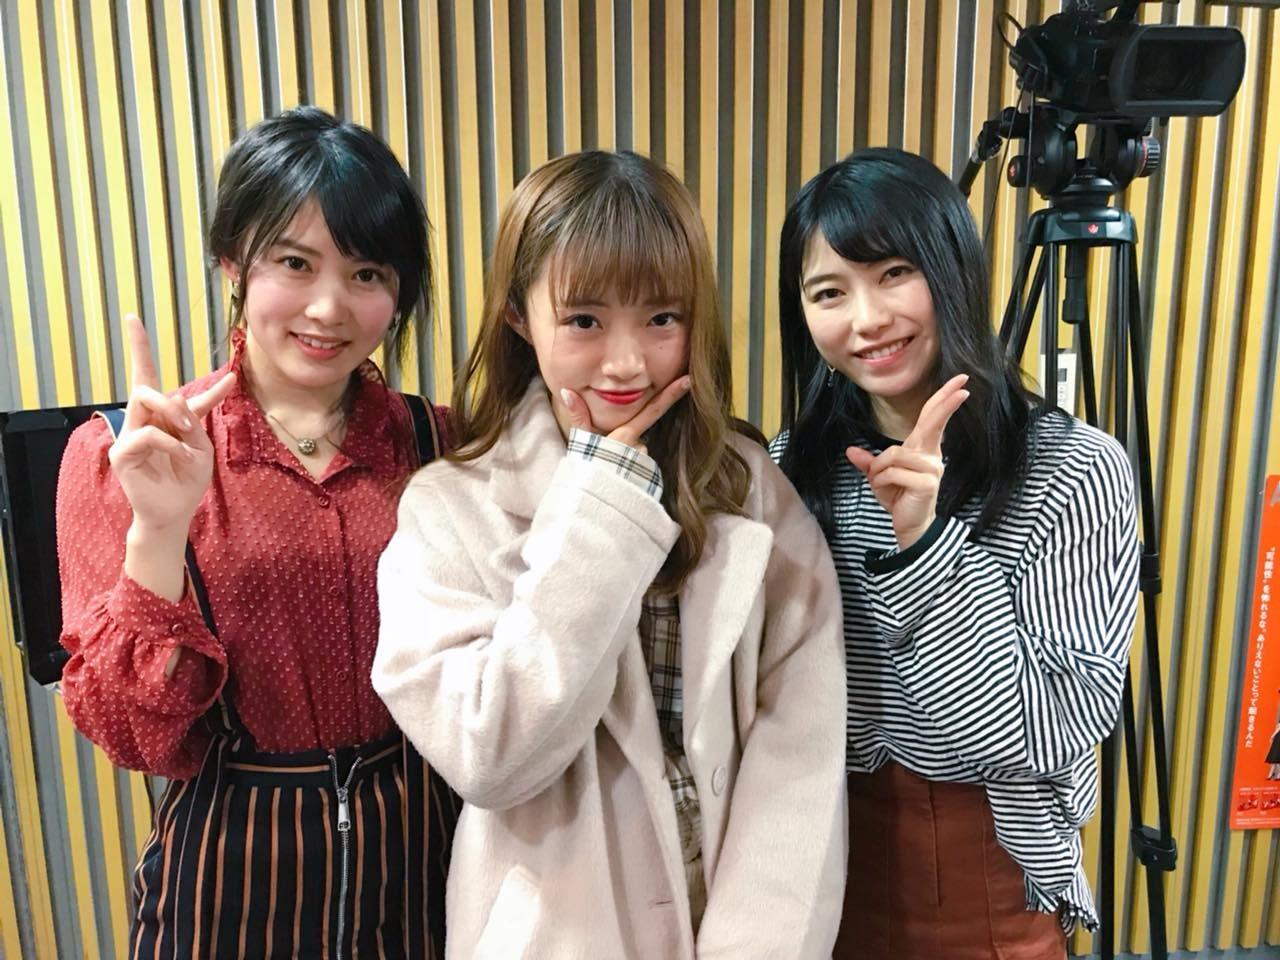 AKB48横山由依・岡部麟・NGT48中井りか「AKB48のオールナイトニッポン」オフショット